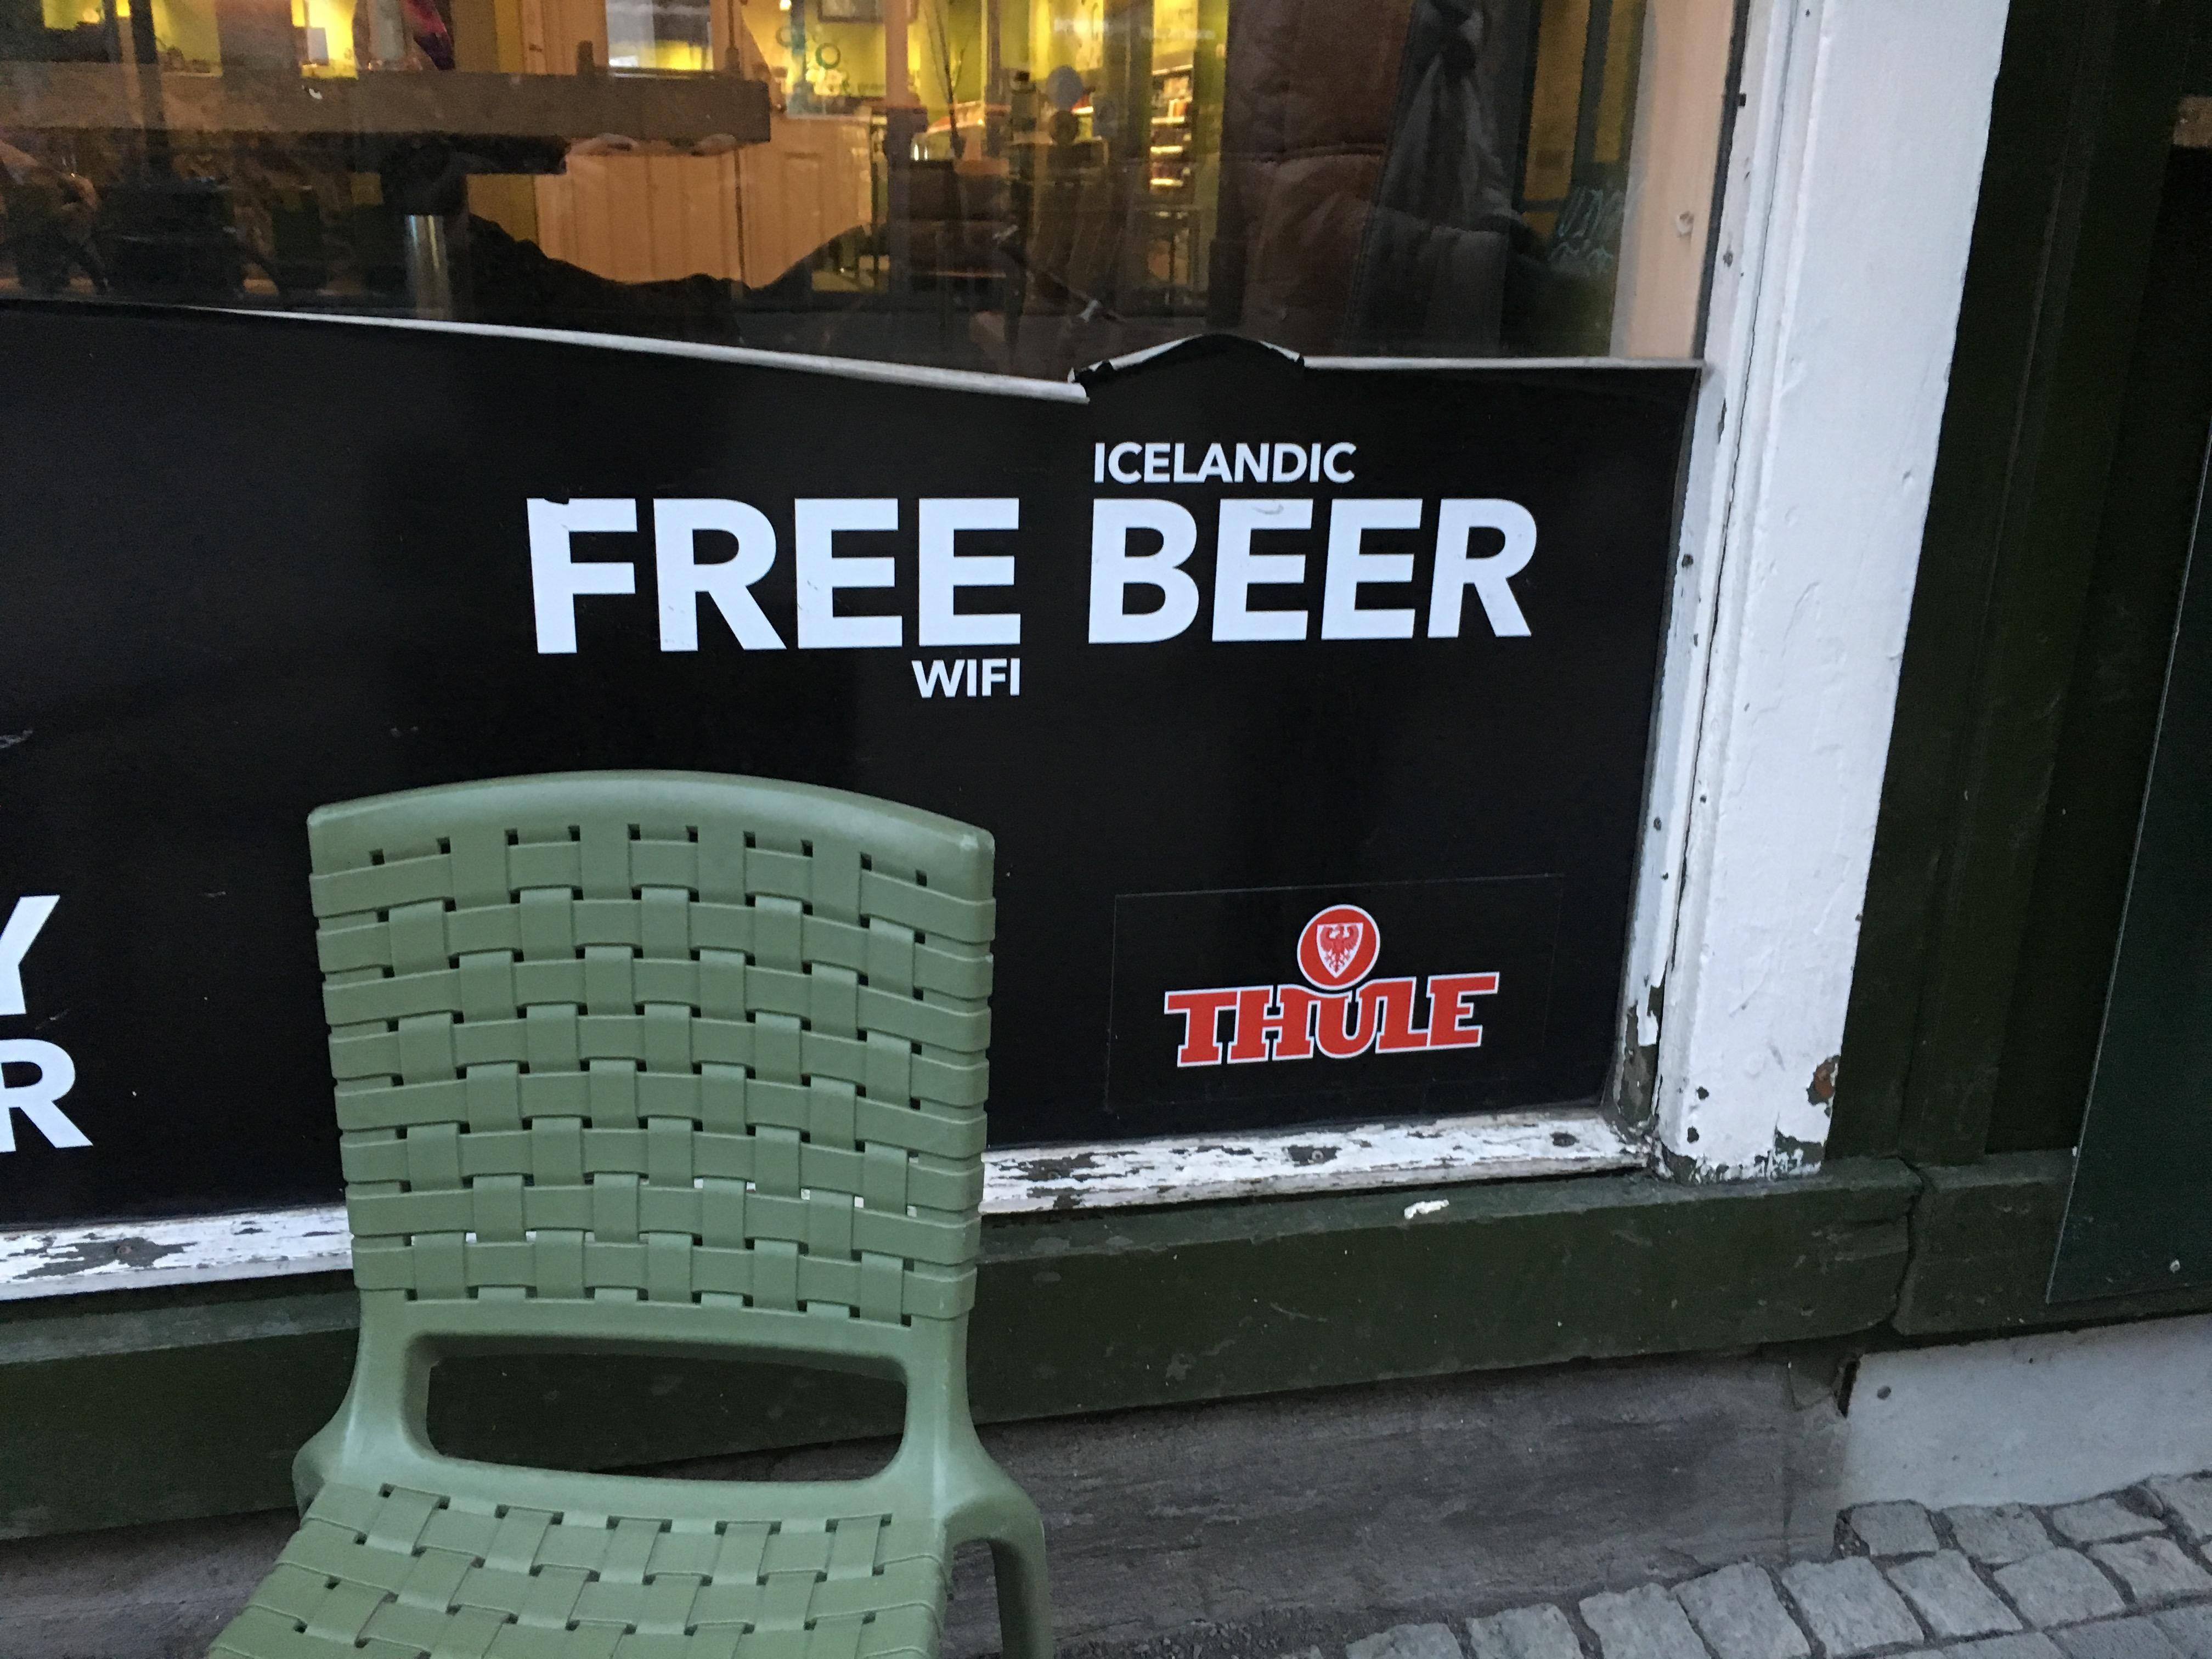 Nice try, random Icelandic bar.